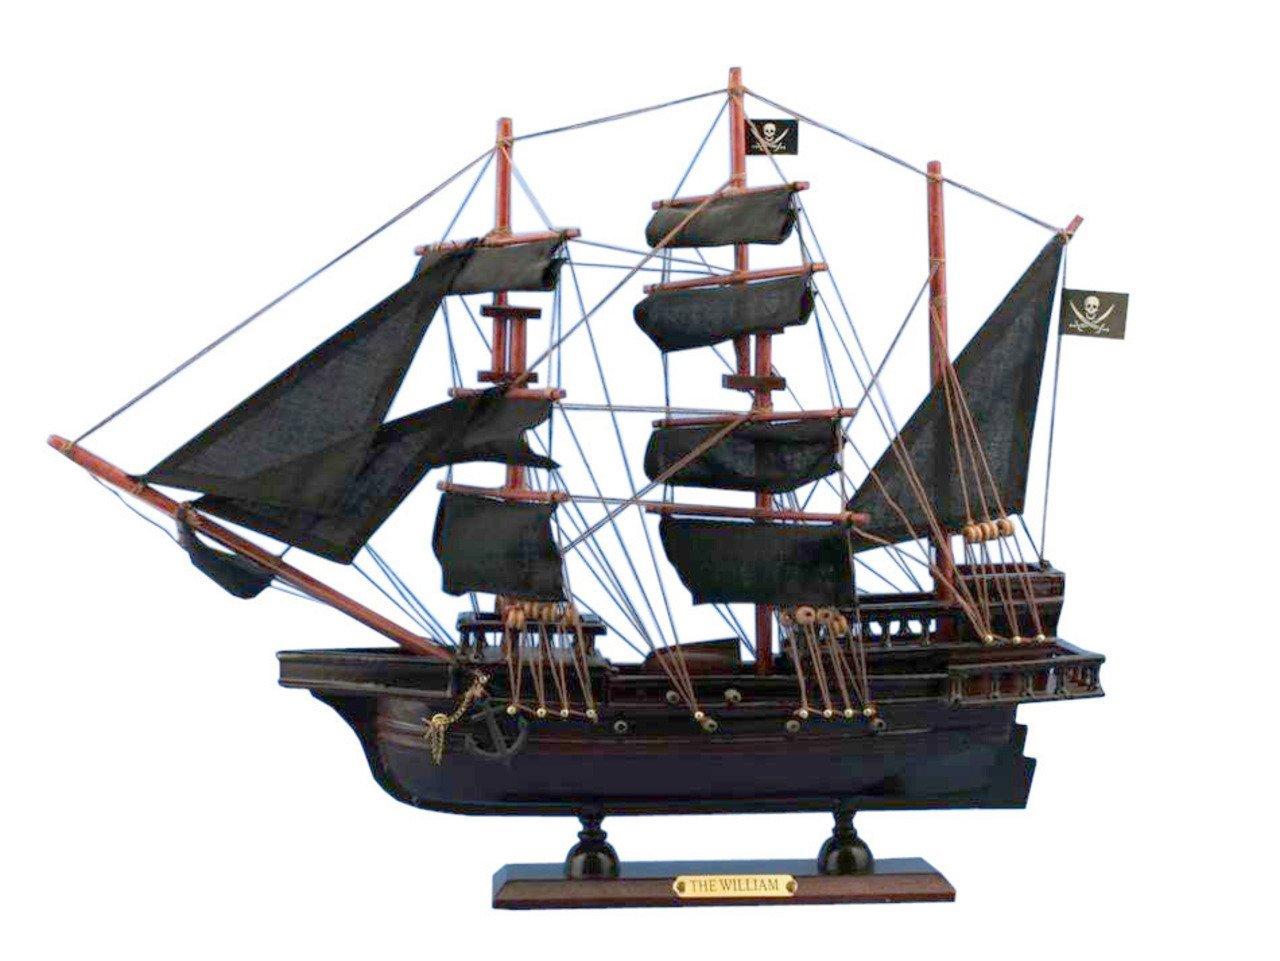 Hampton Nautical Wooden Calico Jack The William Model Pirate Ship, 20''